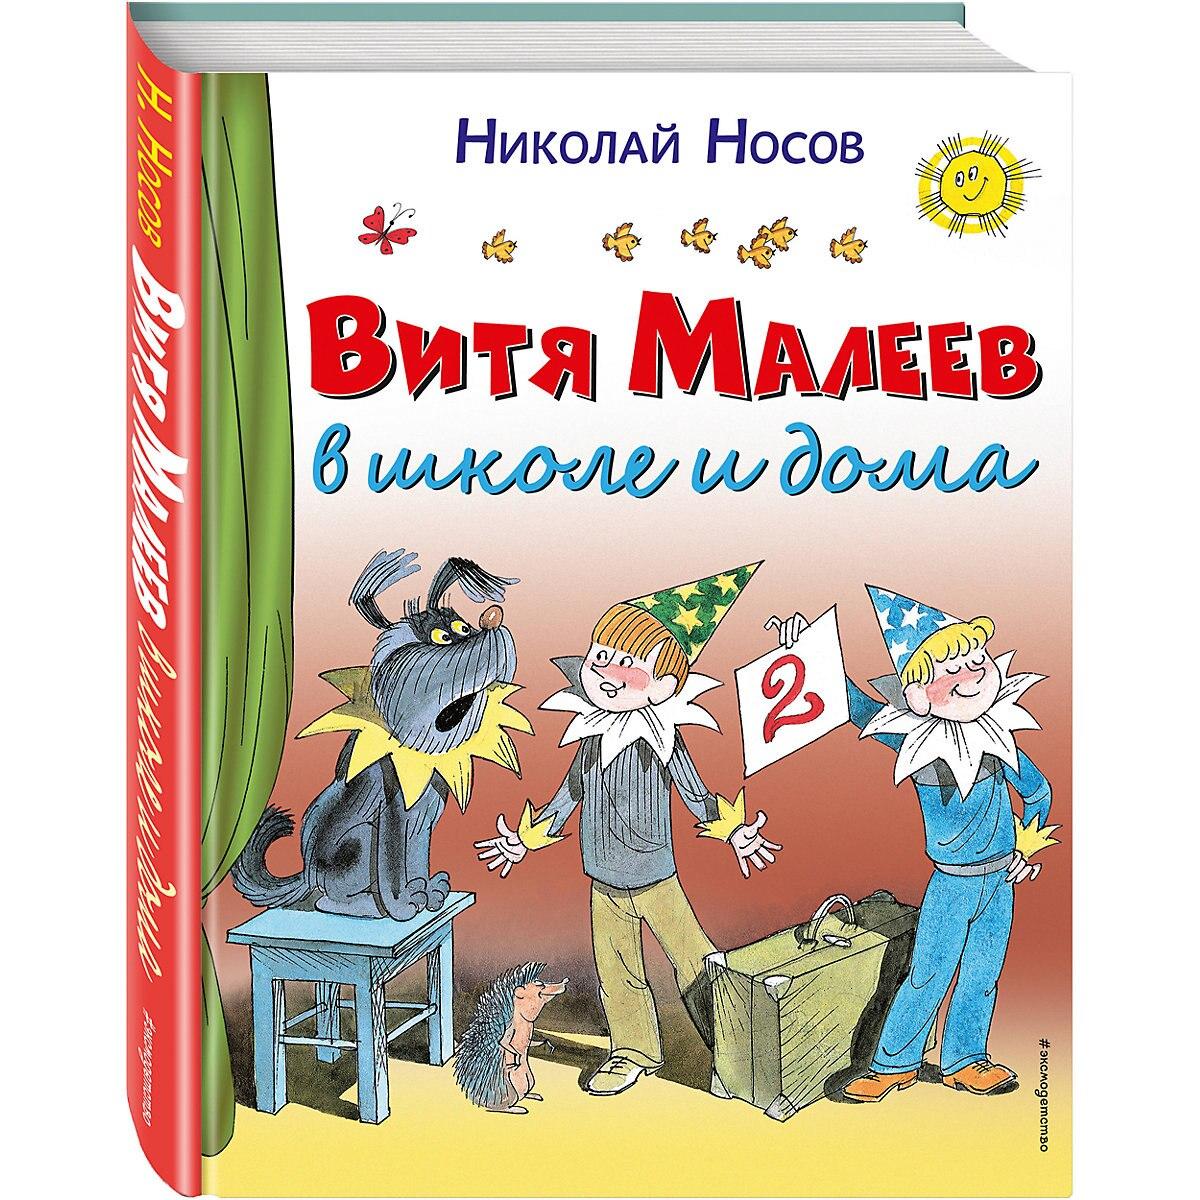 Books EKSMO 5535562 Children Education Encyclopedia Alphabet Dictionary Book For Baby MTpromo